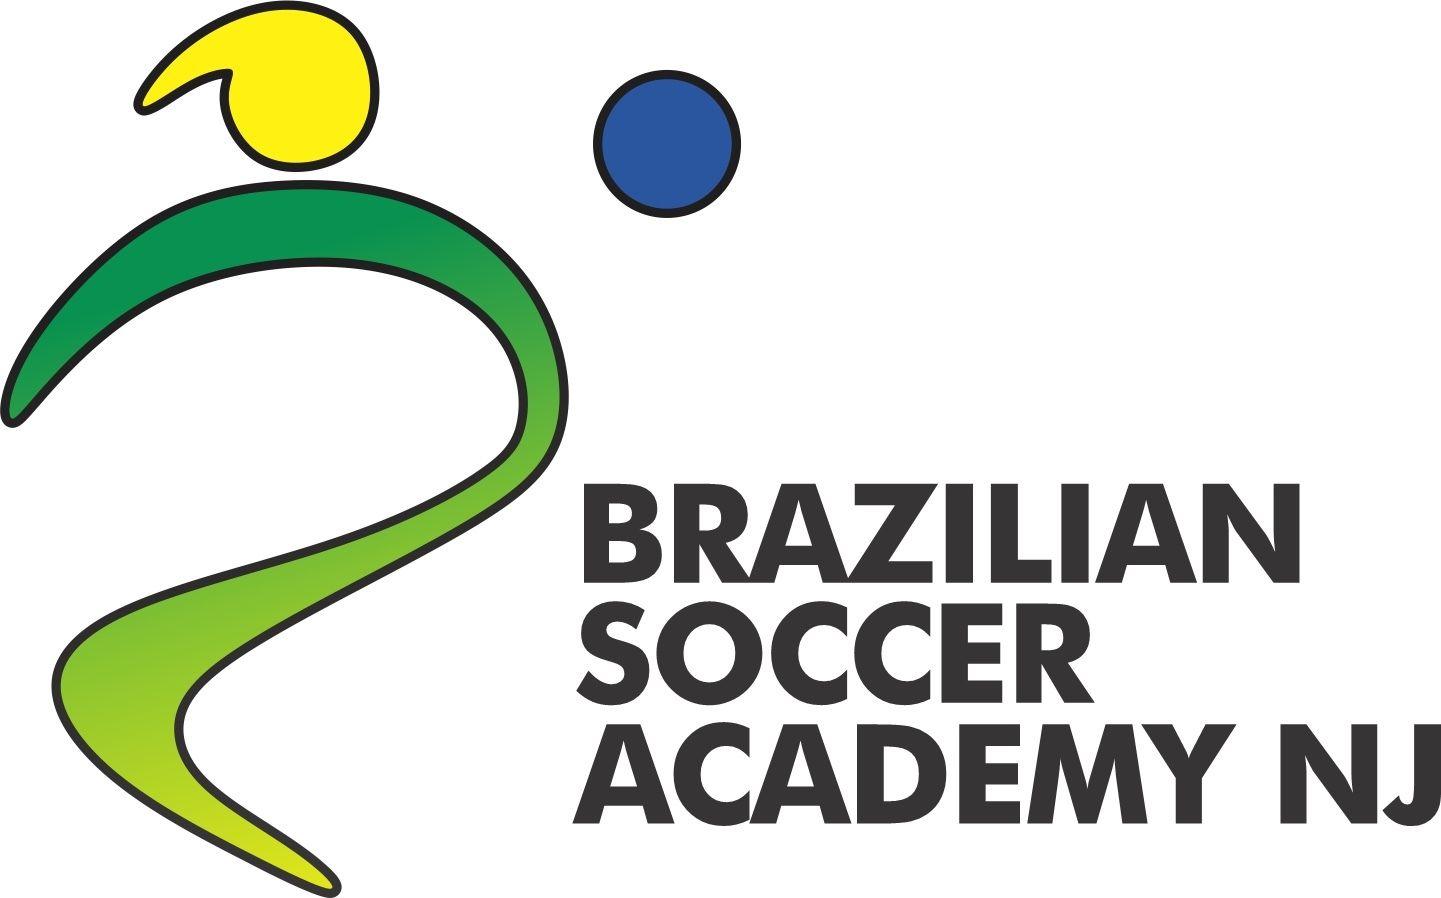 Soccer Adult training Beginners Brazilian Soccer Academy NJ